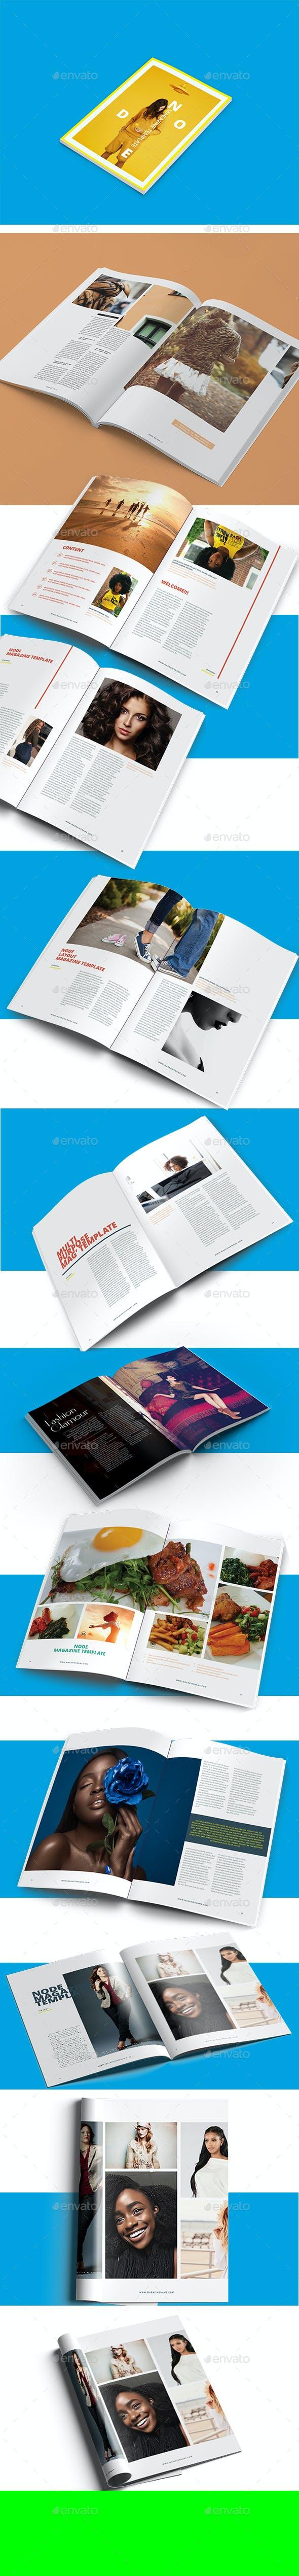 node minimalist magazine design template layout by evolysdigital